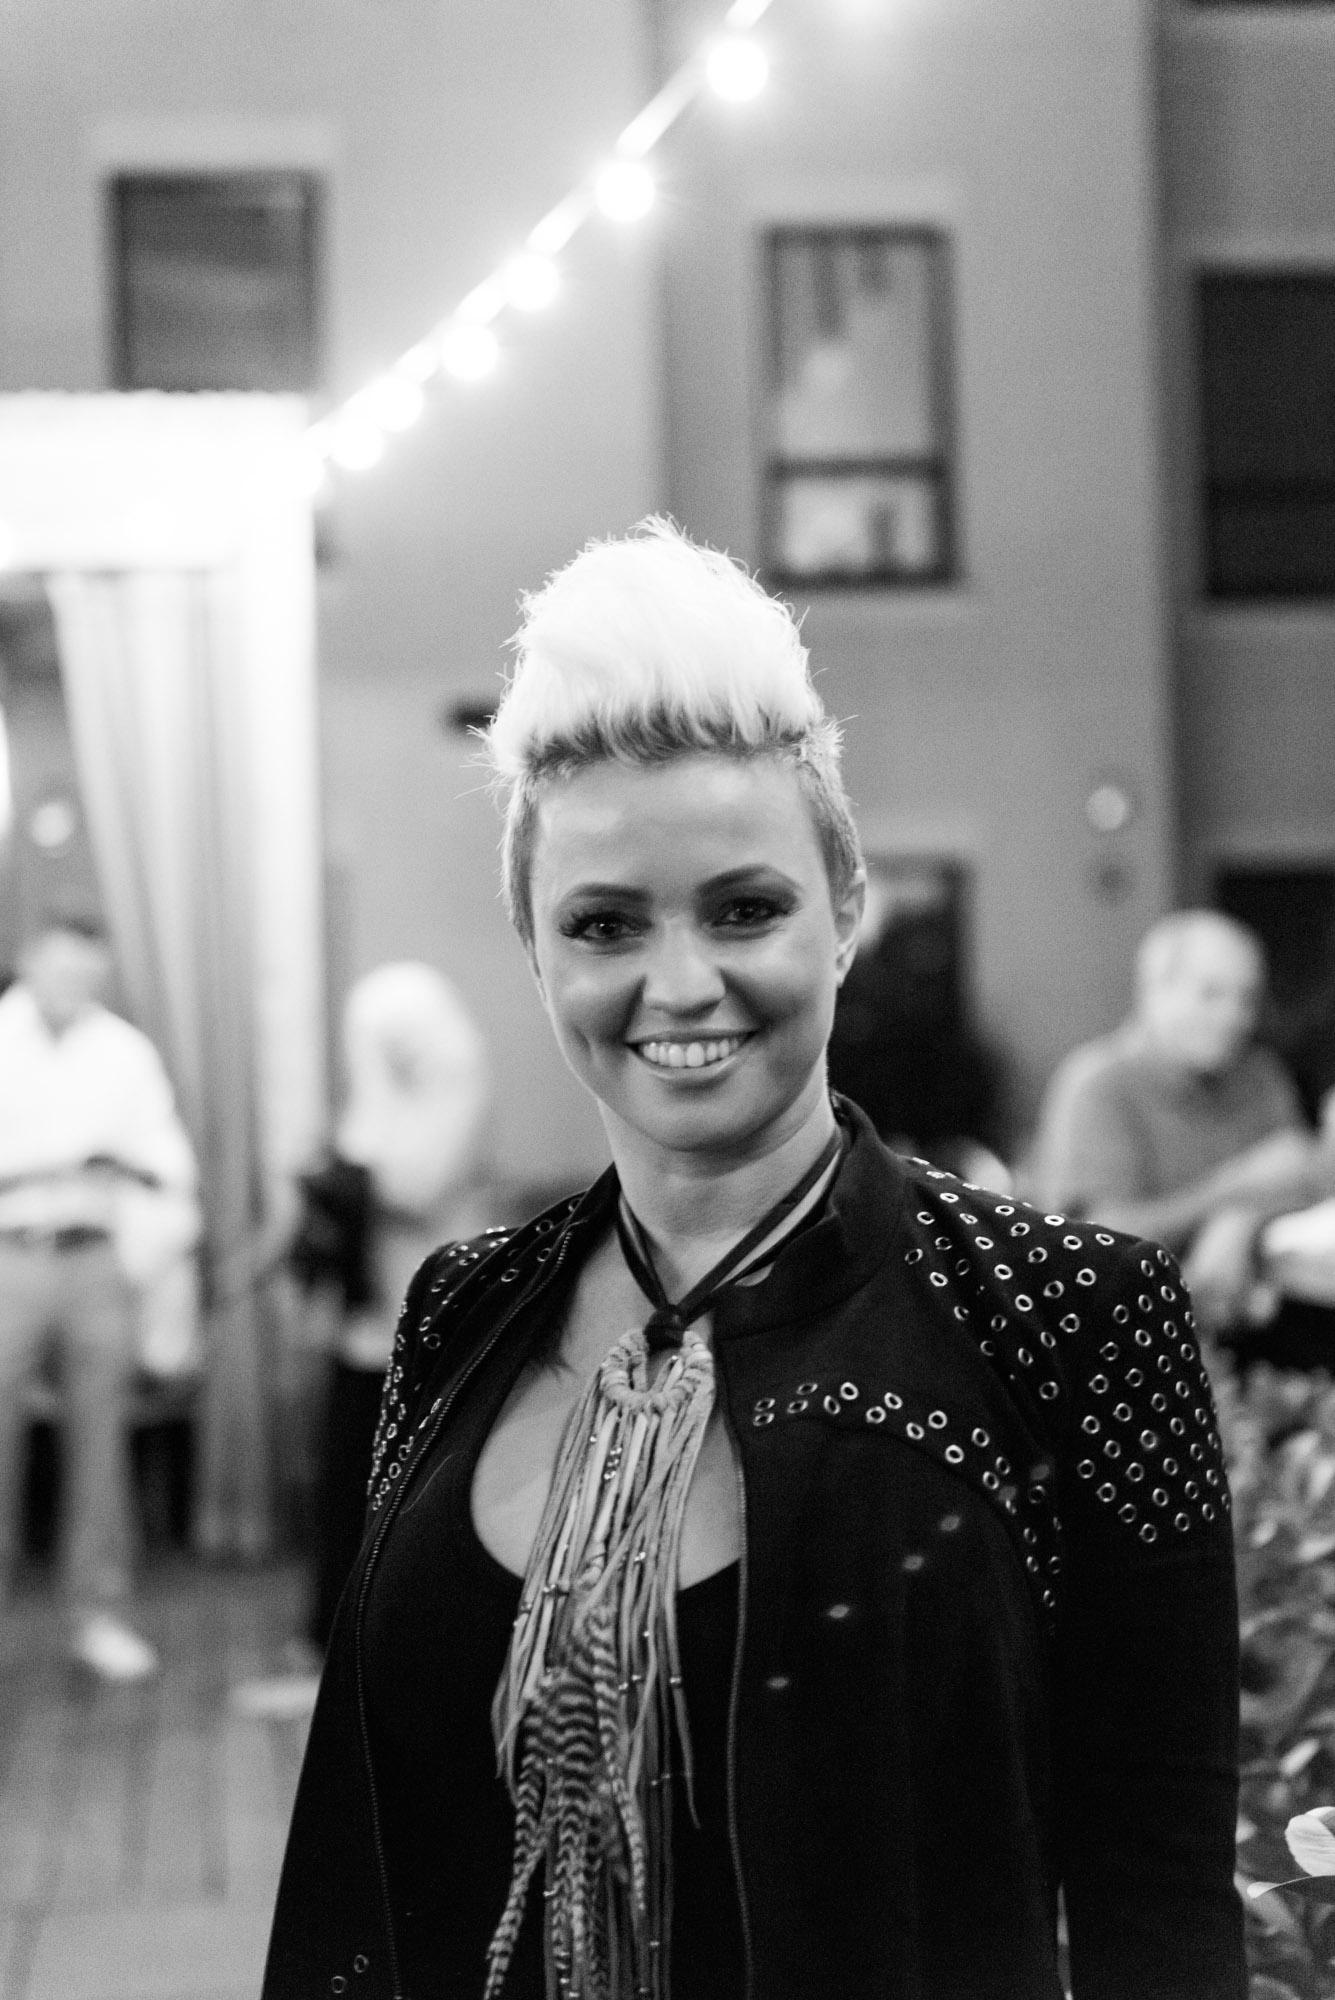 Cakeplate Fashion Show Guest | Andaz Napa, Napa, California